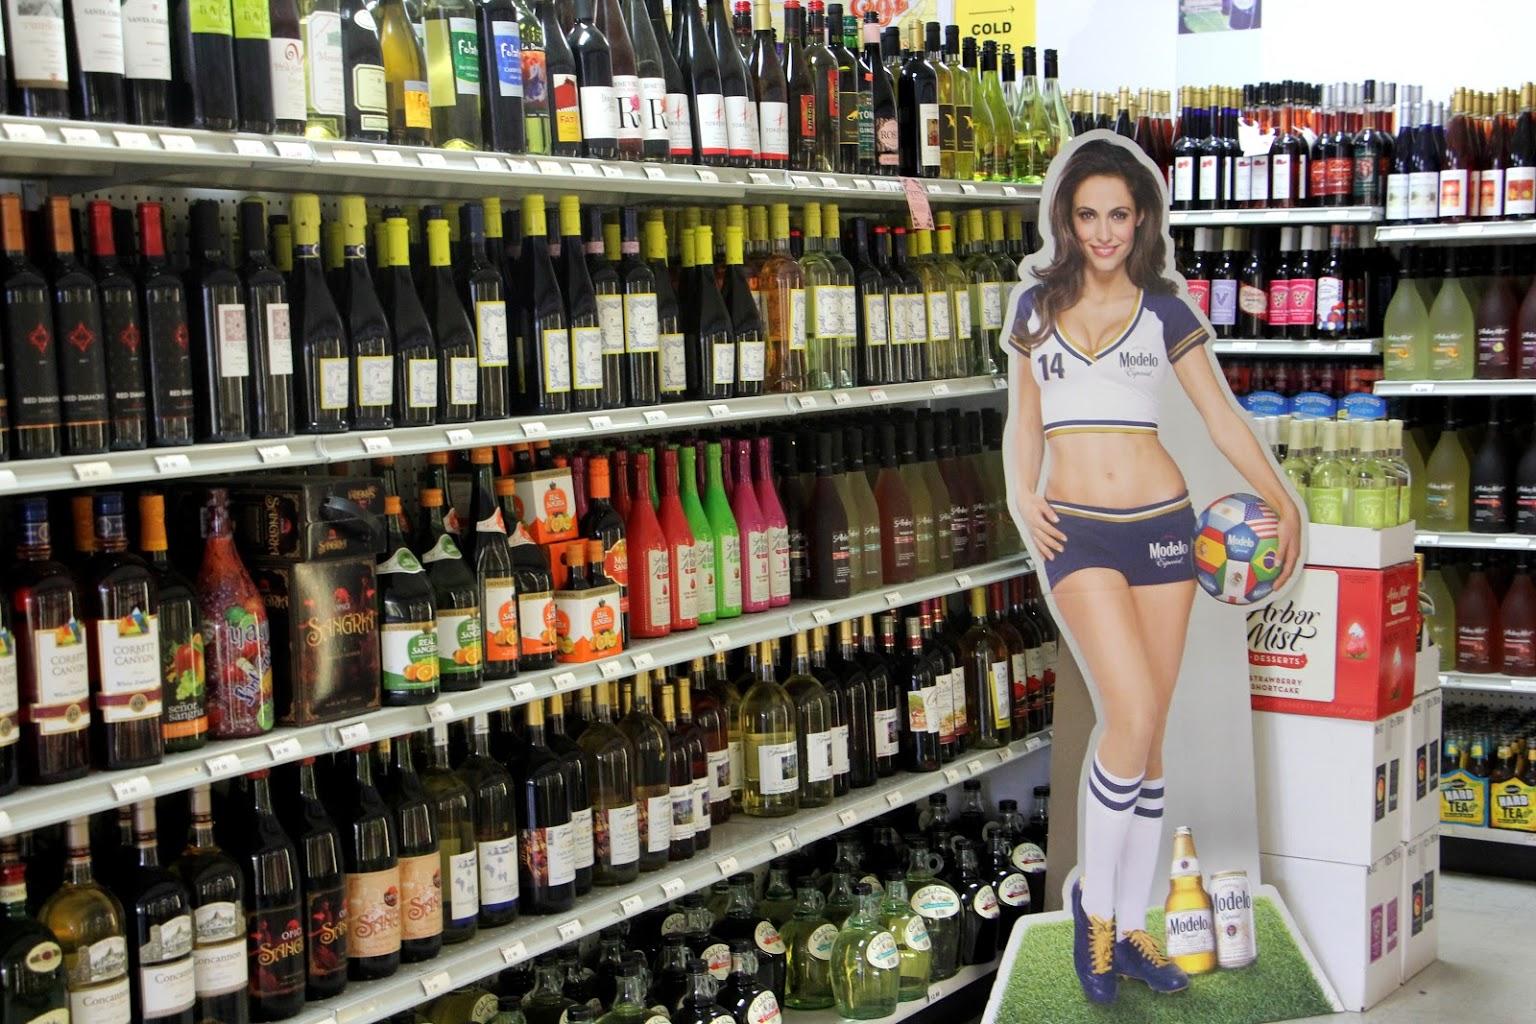 wine display at Pike Wines & Liquors in Hammonton, NJ